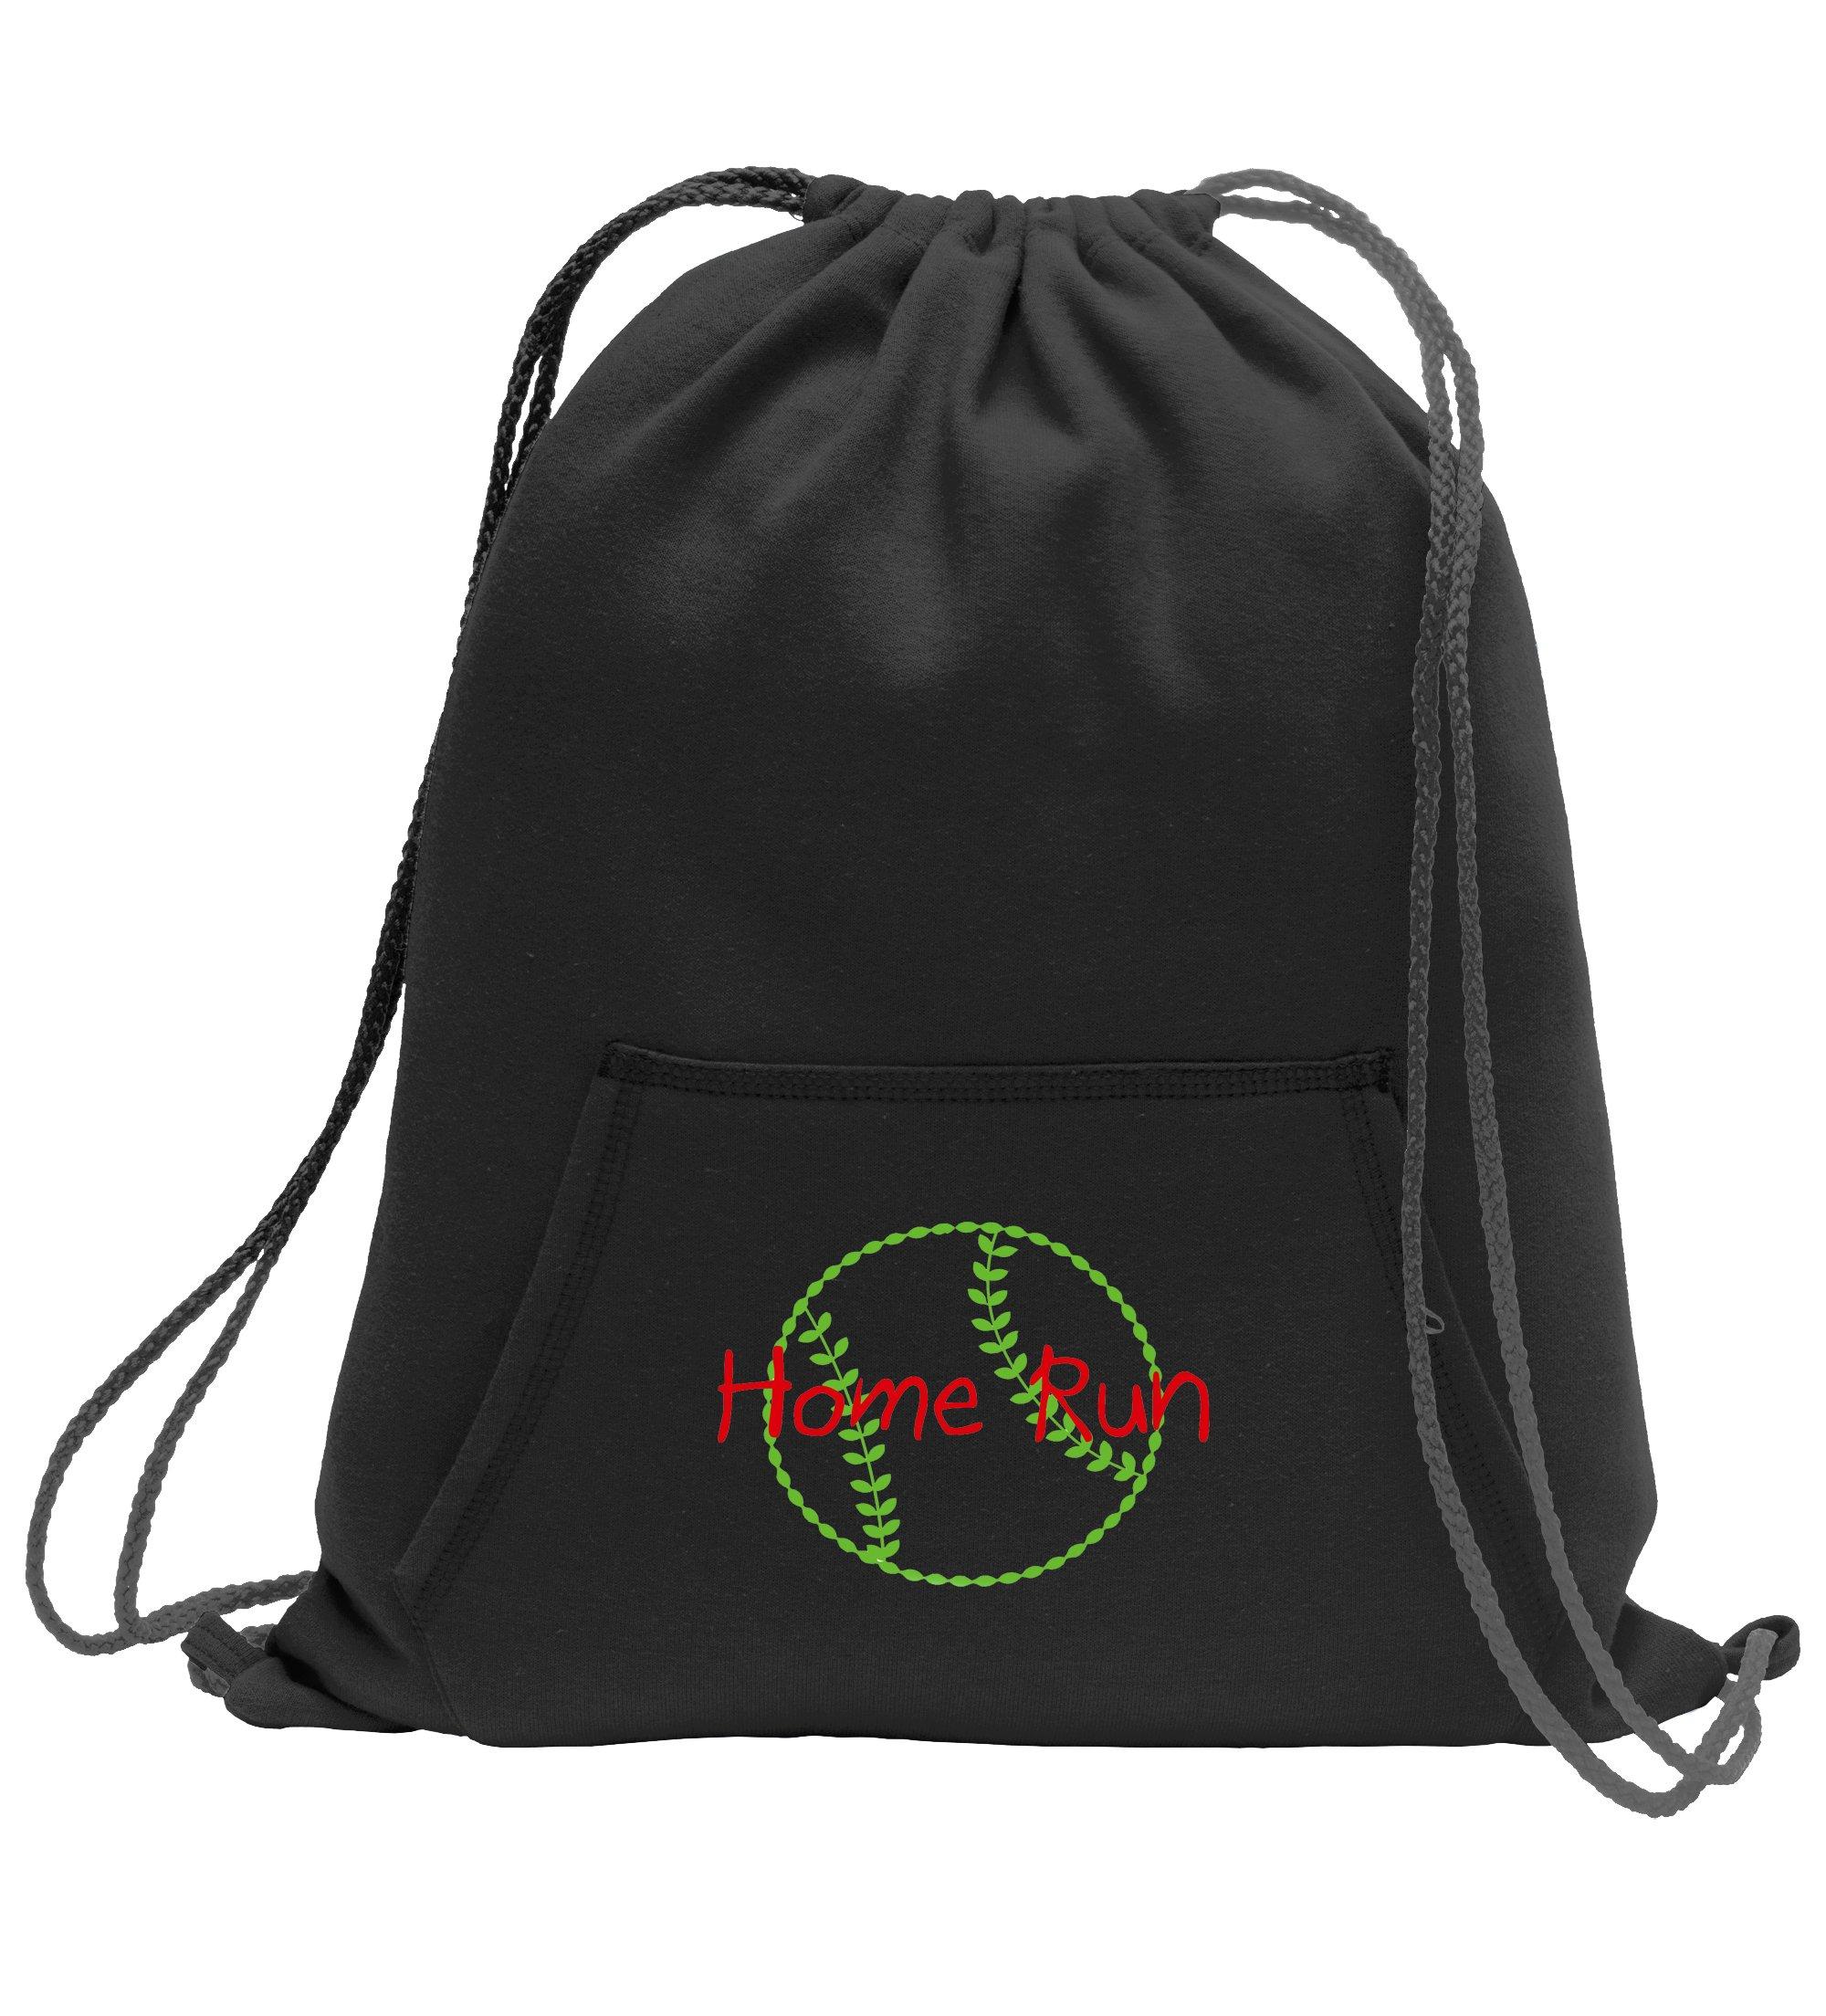 Baseball Softball Personalized - Sweatshirt Cinch Bag with Kangaroo Pocket (Jet Black)